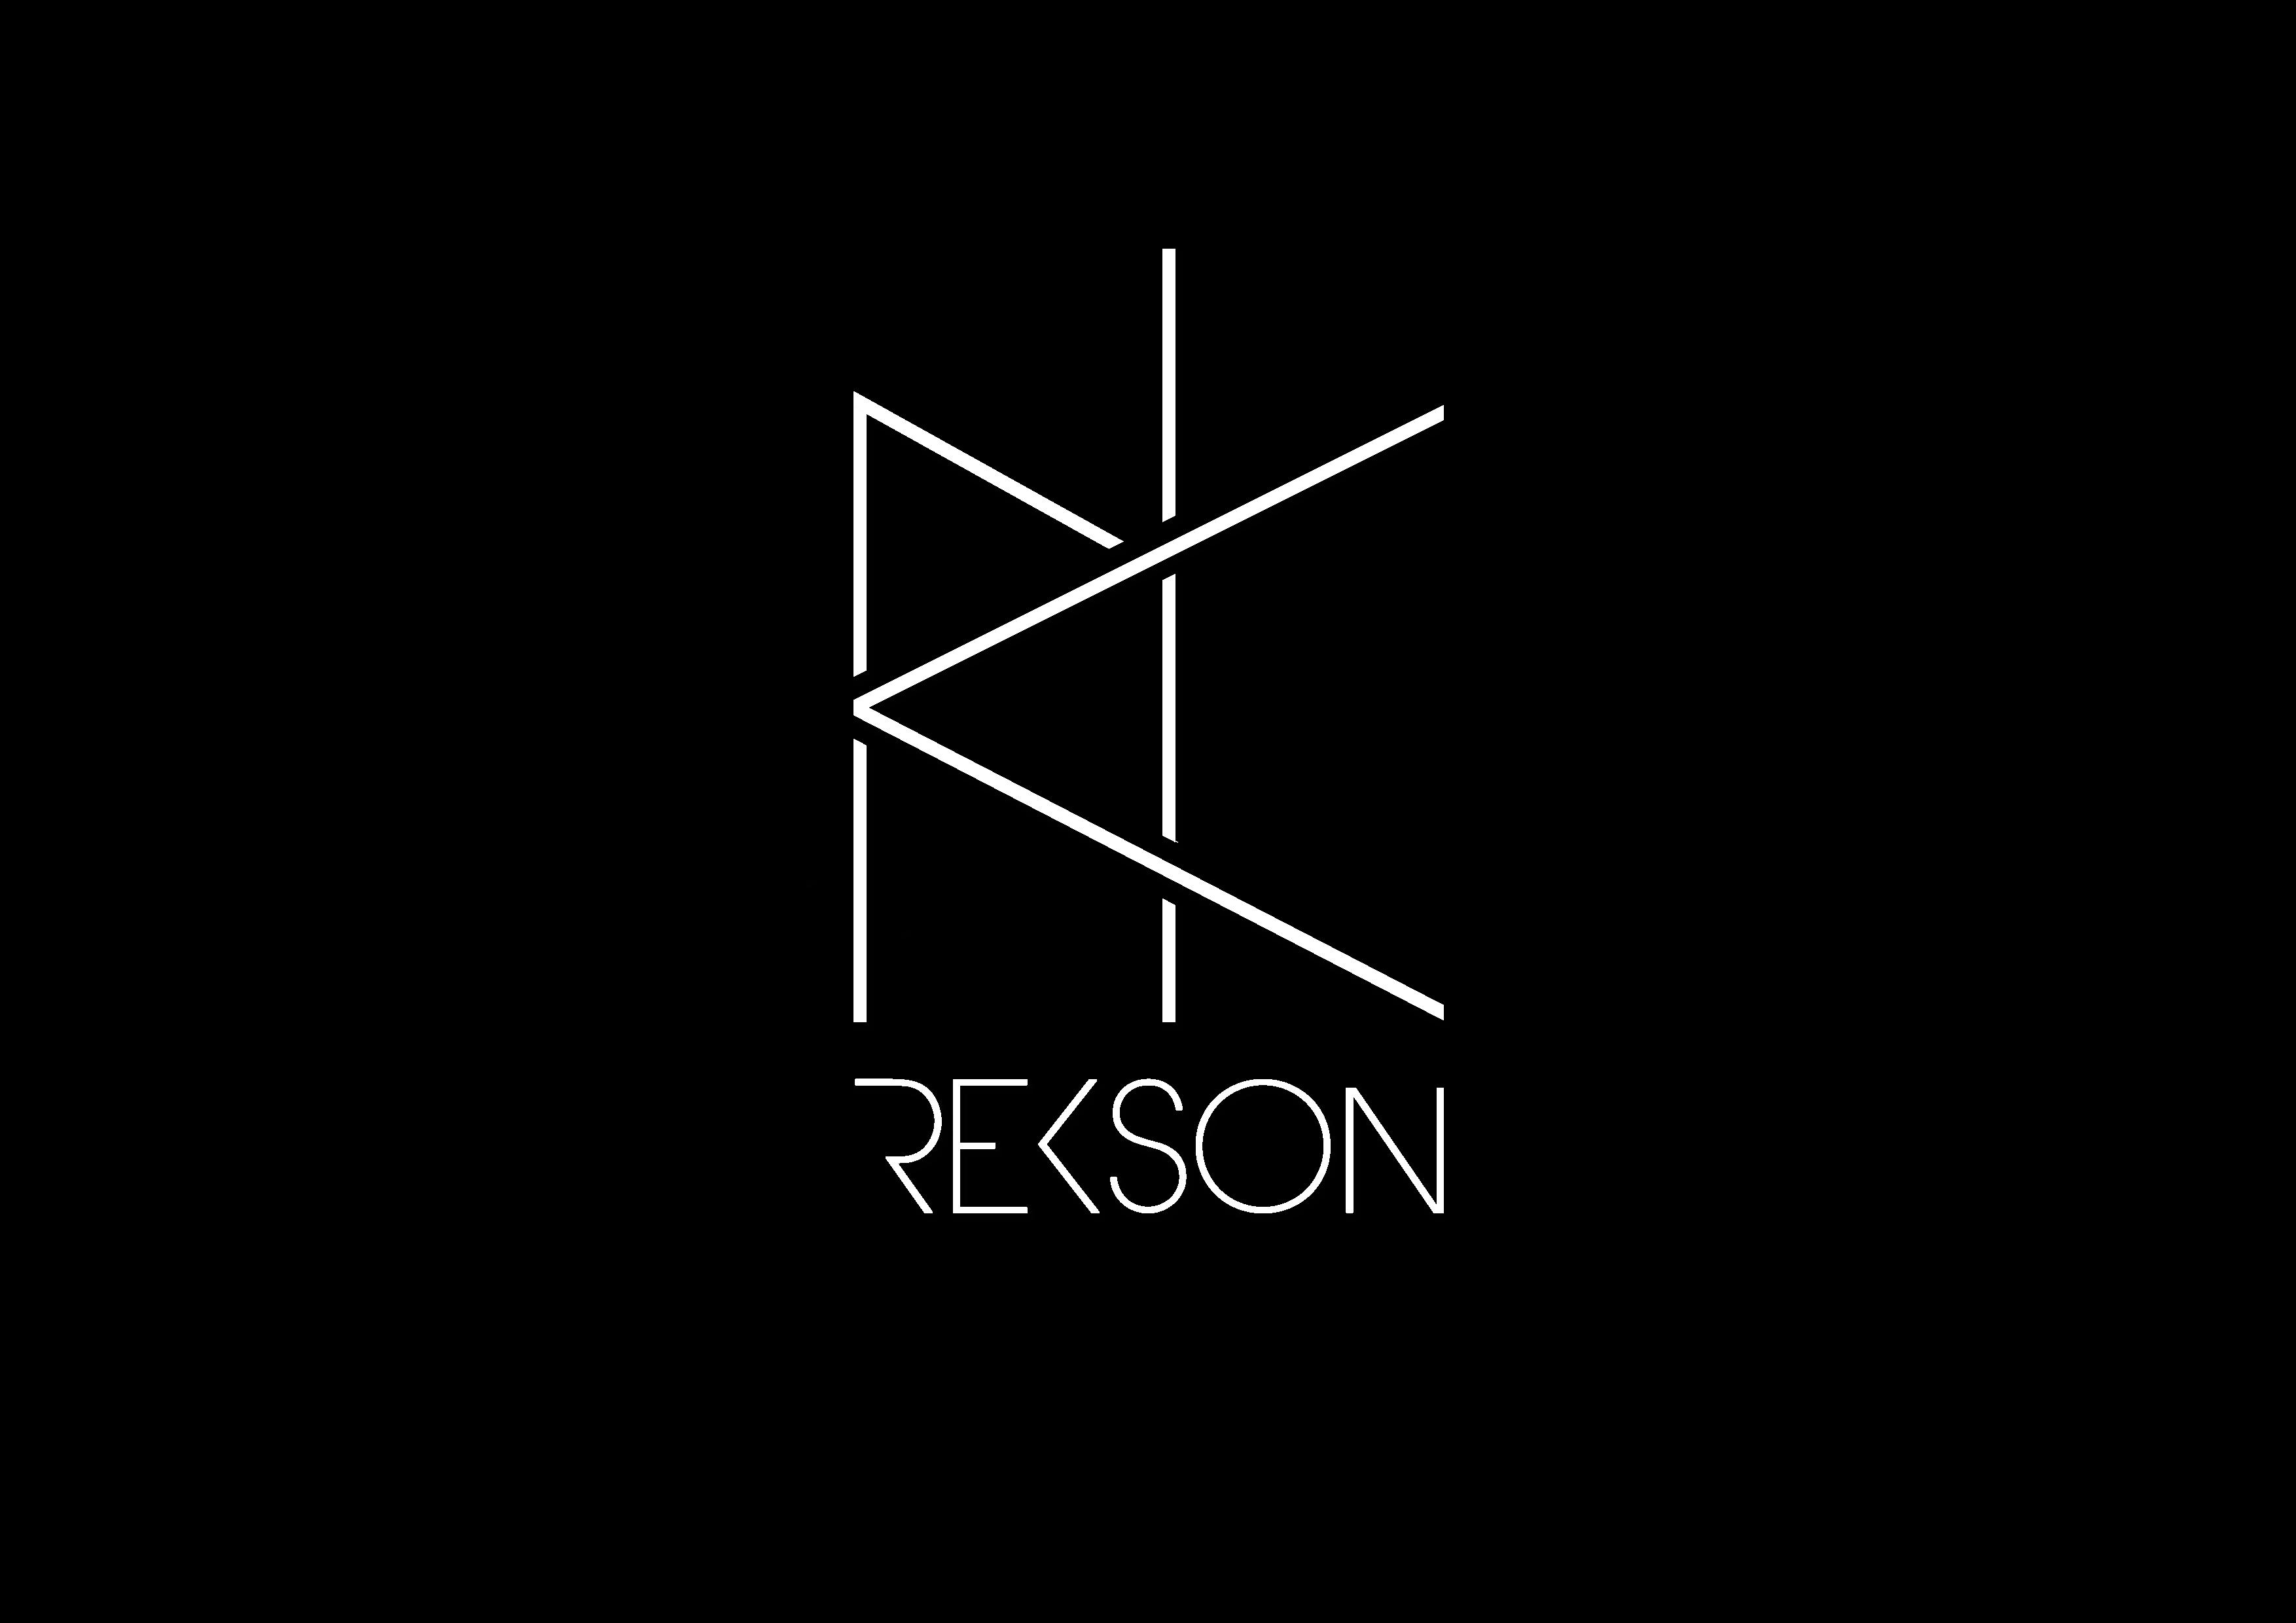 rekson-logo-dj-photobooth